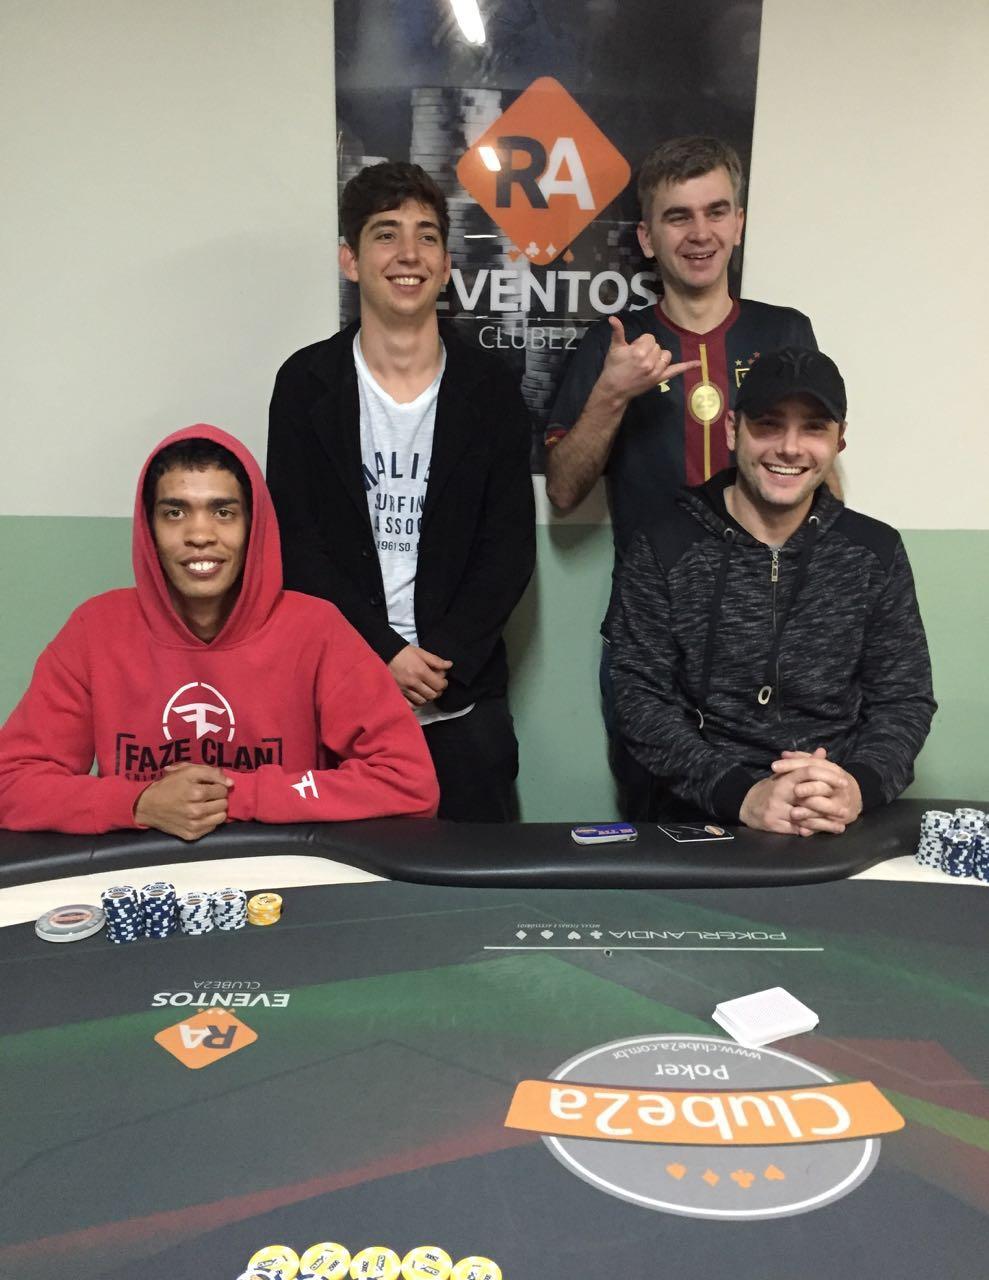 Catarinense poker chapeco